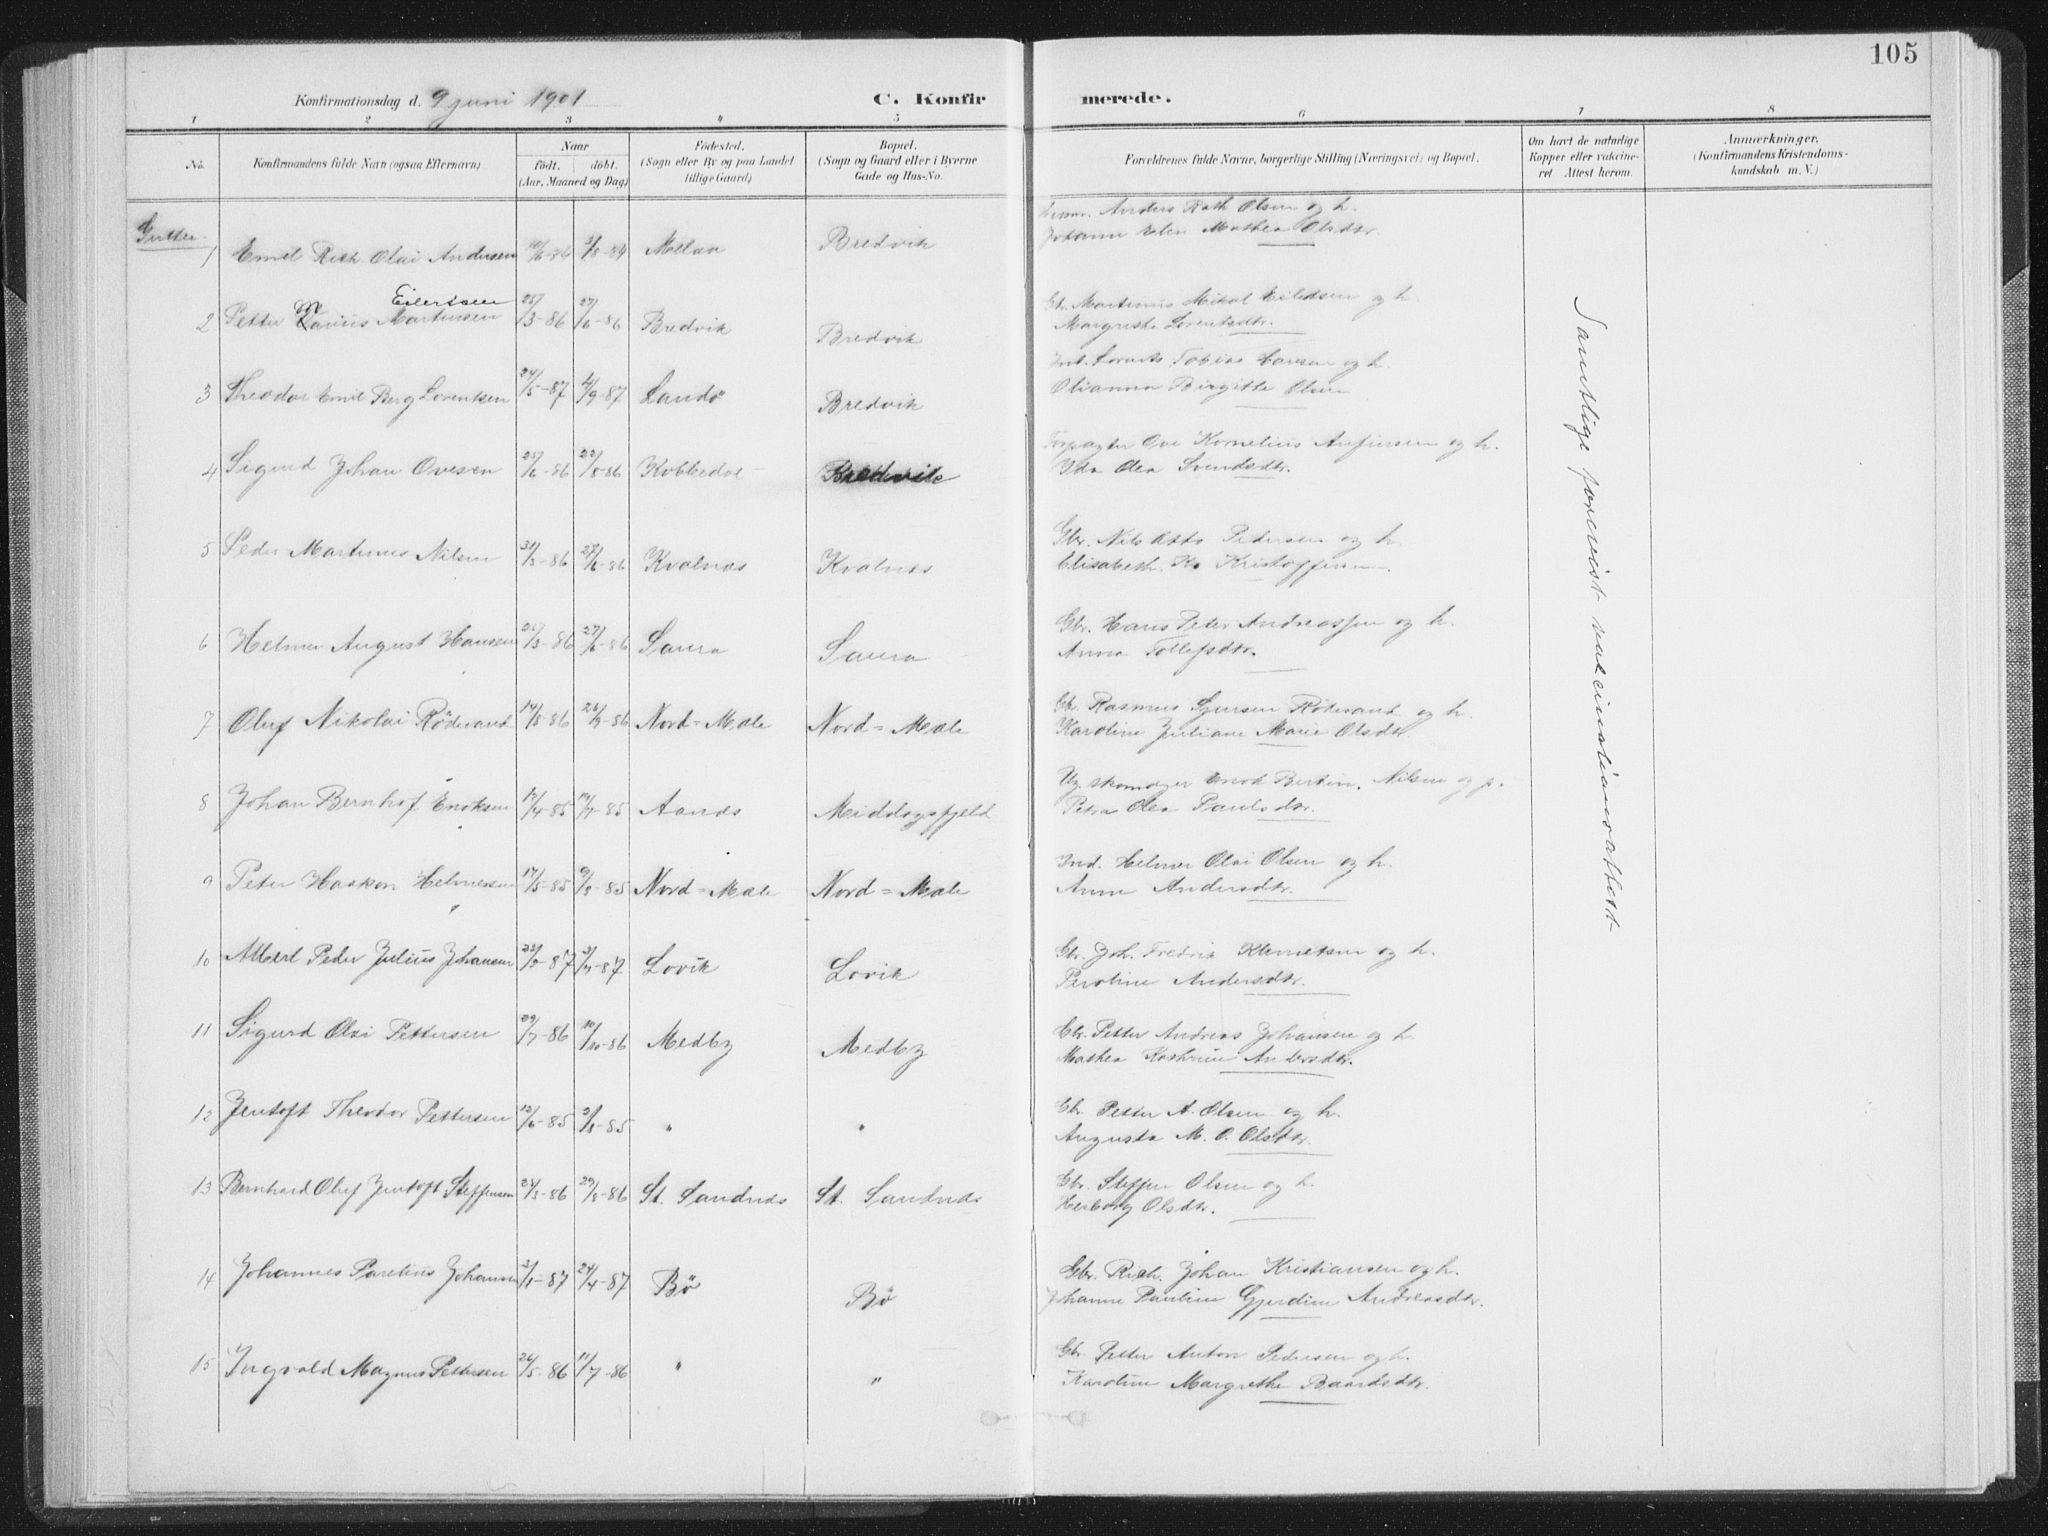 SAT, Ministerialprotokoller, klokkerbøker og fødselsregistre - Nordland, 897/L1400: Ministerialbok nr. 897A07, 1897-1908, s. 105